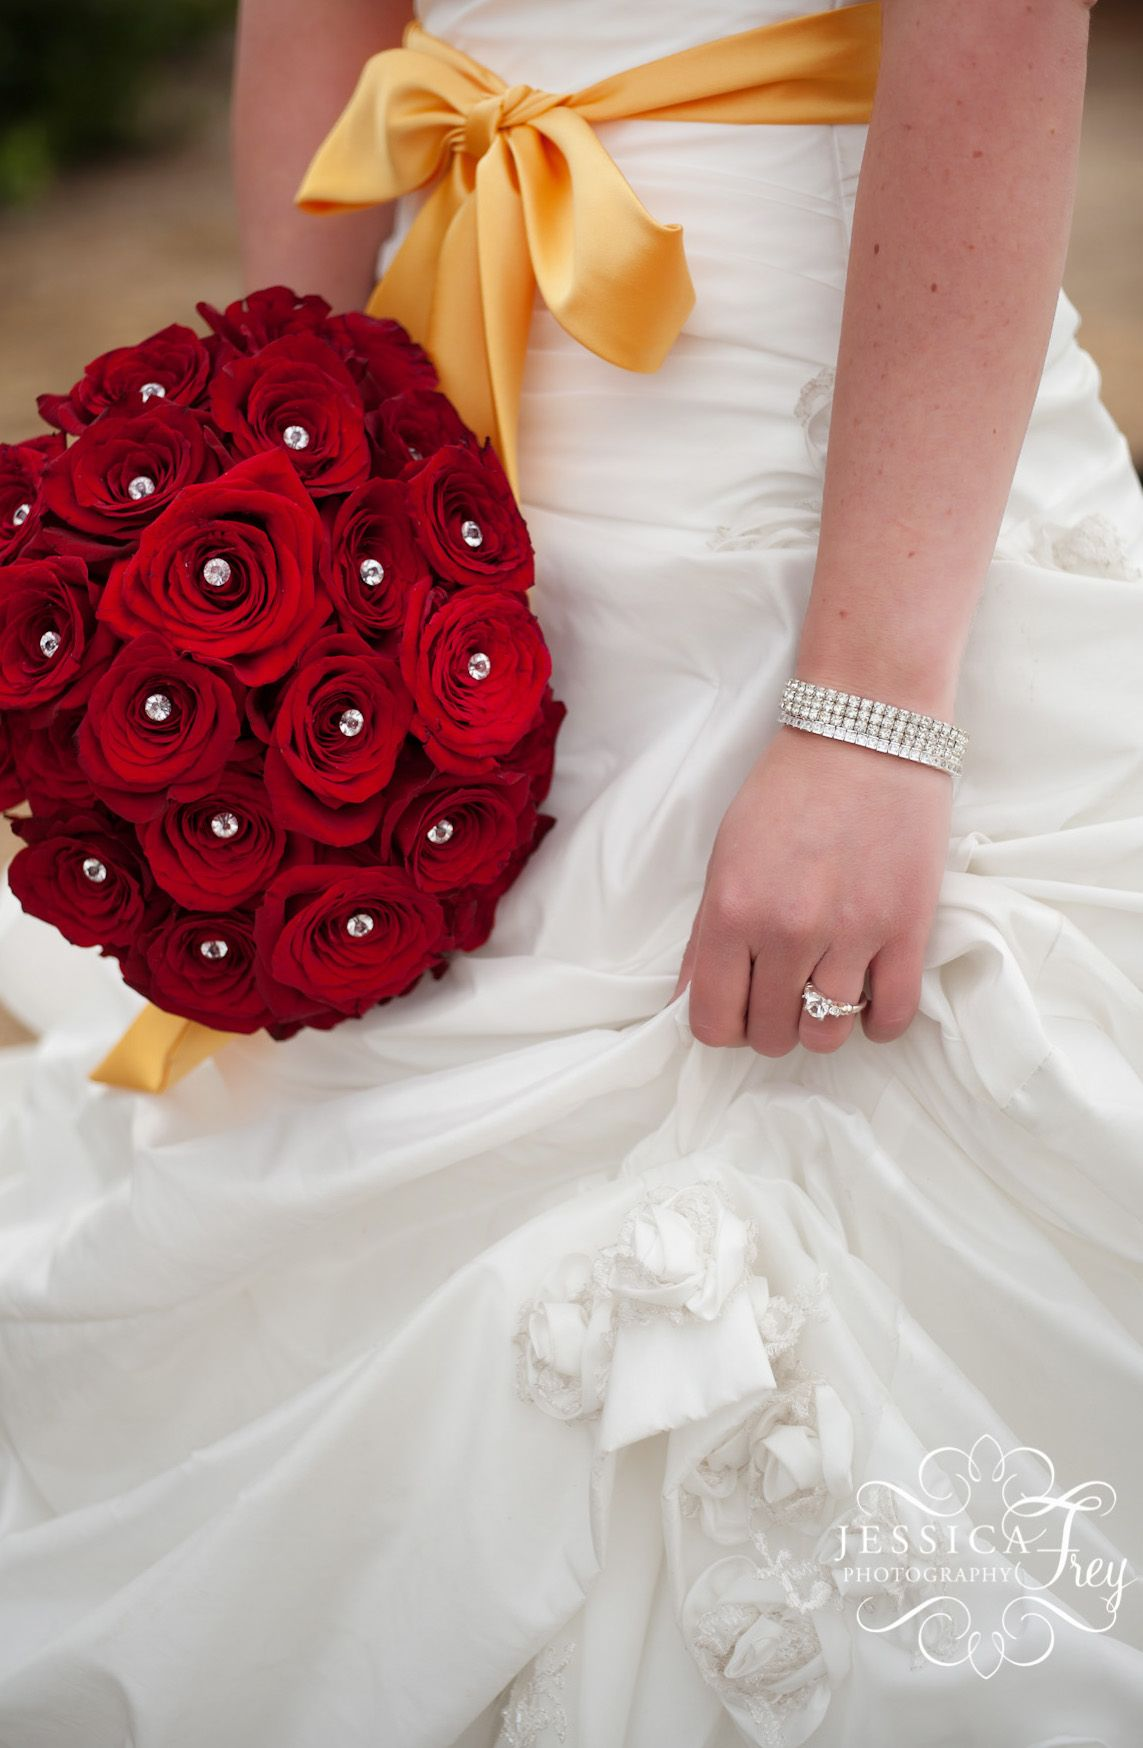 Beauty And The Beast Wedding Dress: Beauty And The Beast Wedding Ideas